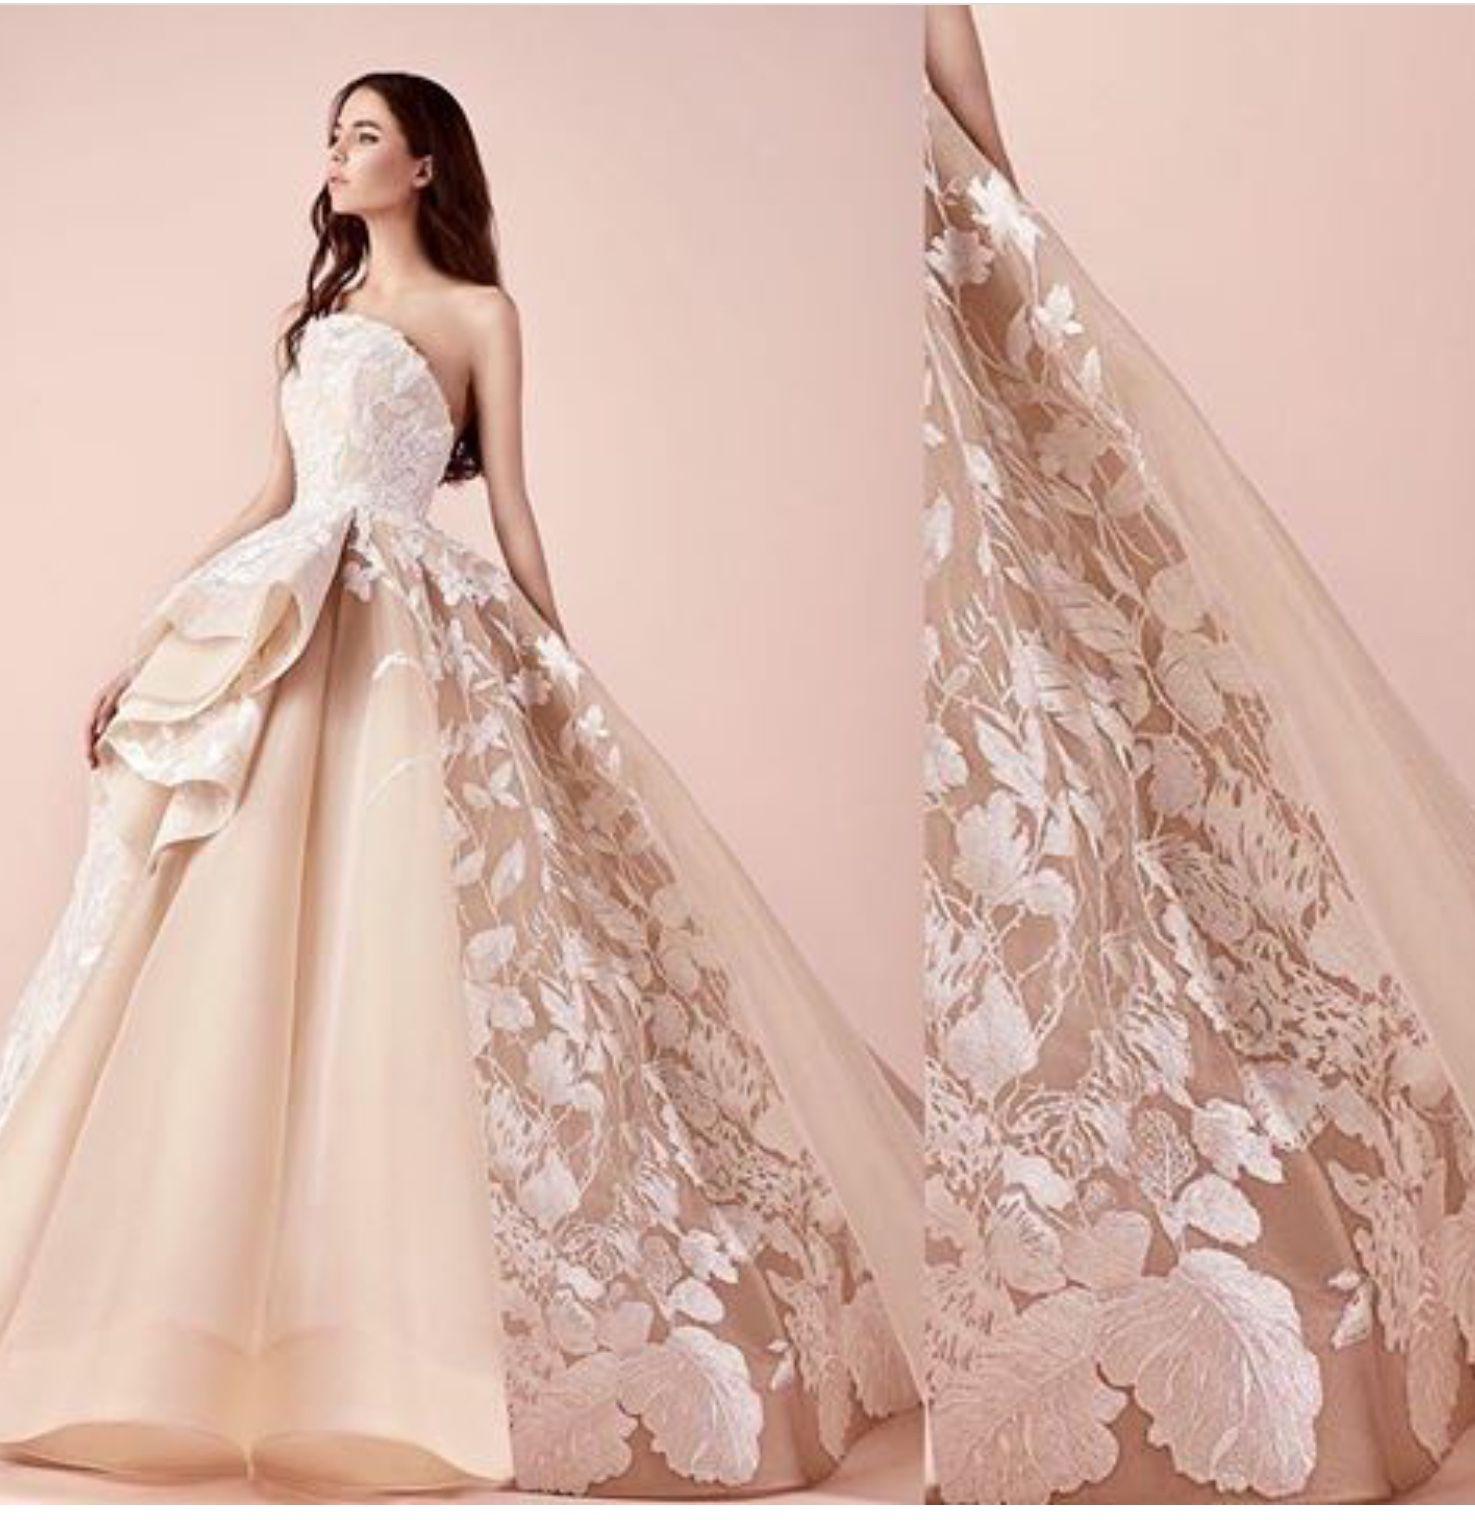 Pin de Brides by Liza en Wedding Color pink dresses and etc.   Pinterest